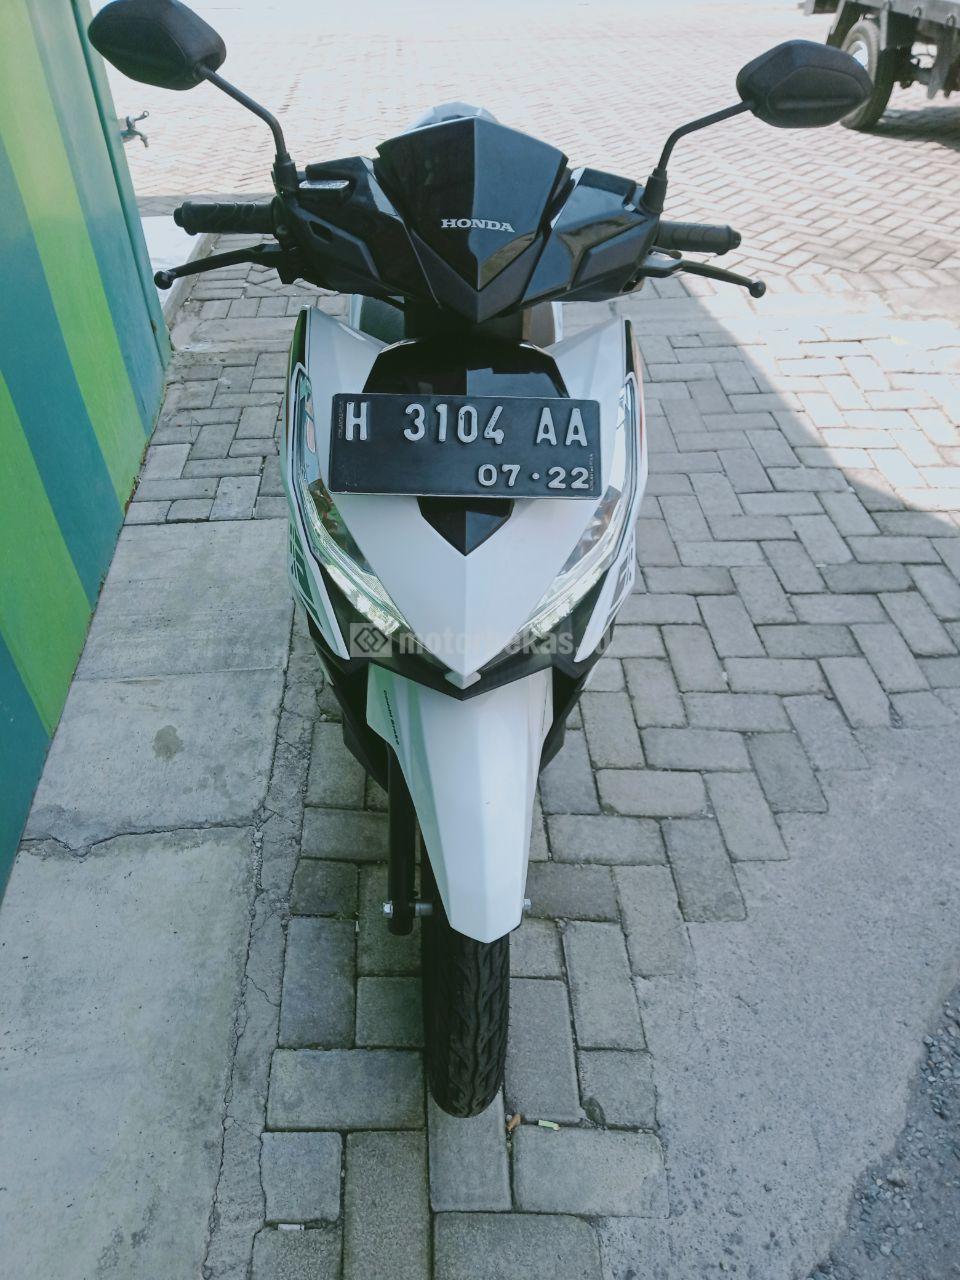 HONDA VARIO 125 FI 4119 motorbekas.id